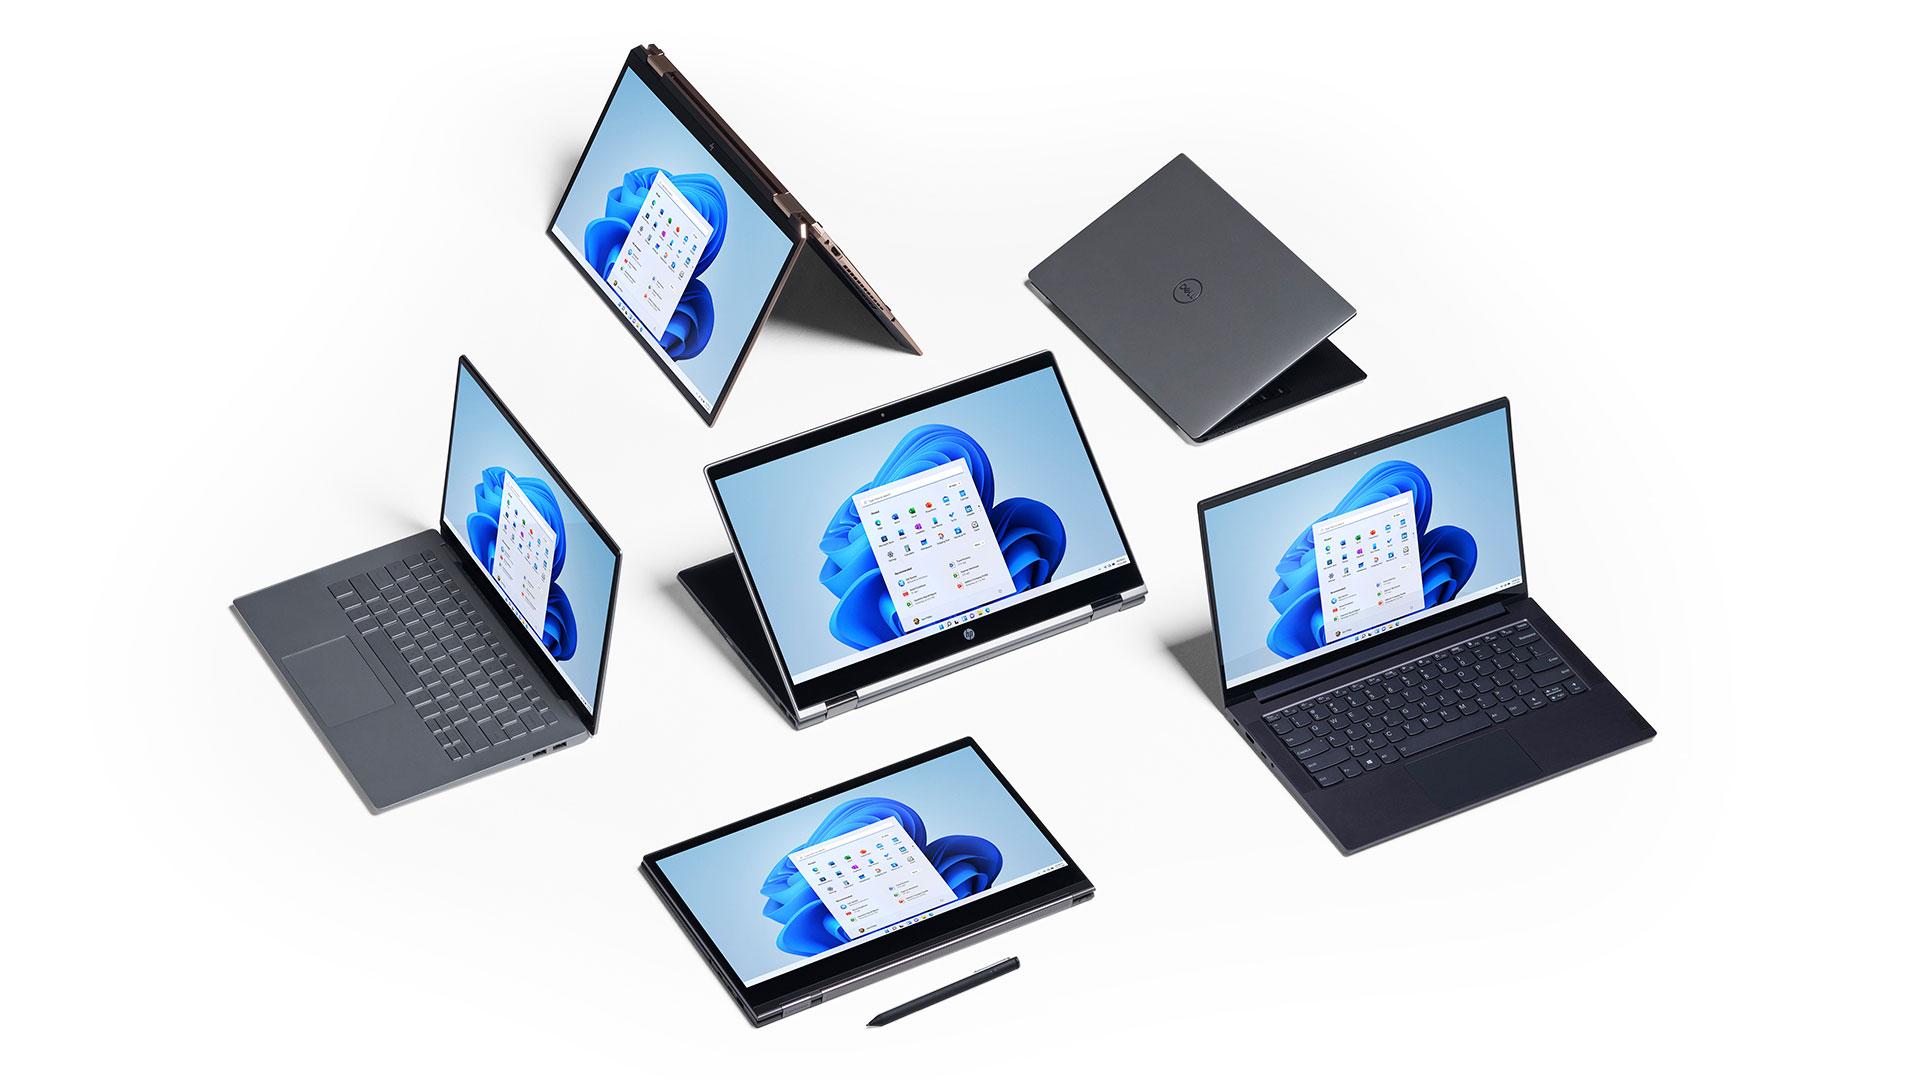 Řada 6 počítačů s Windows 11